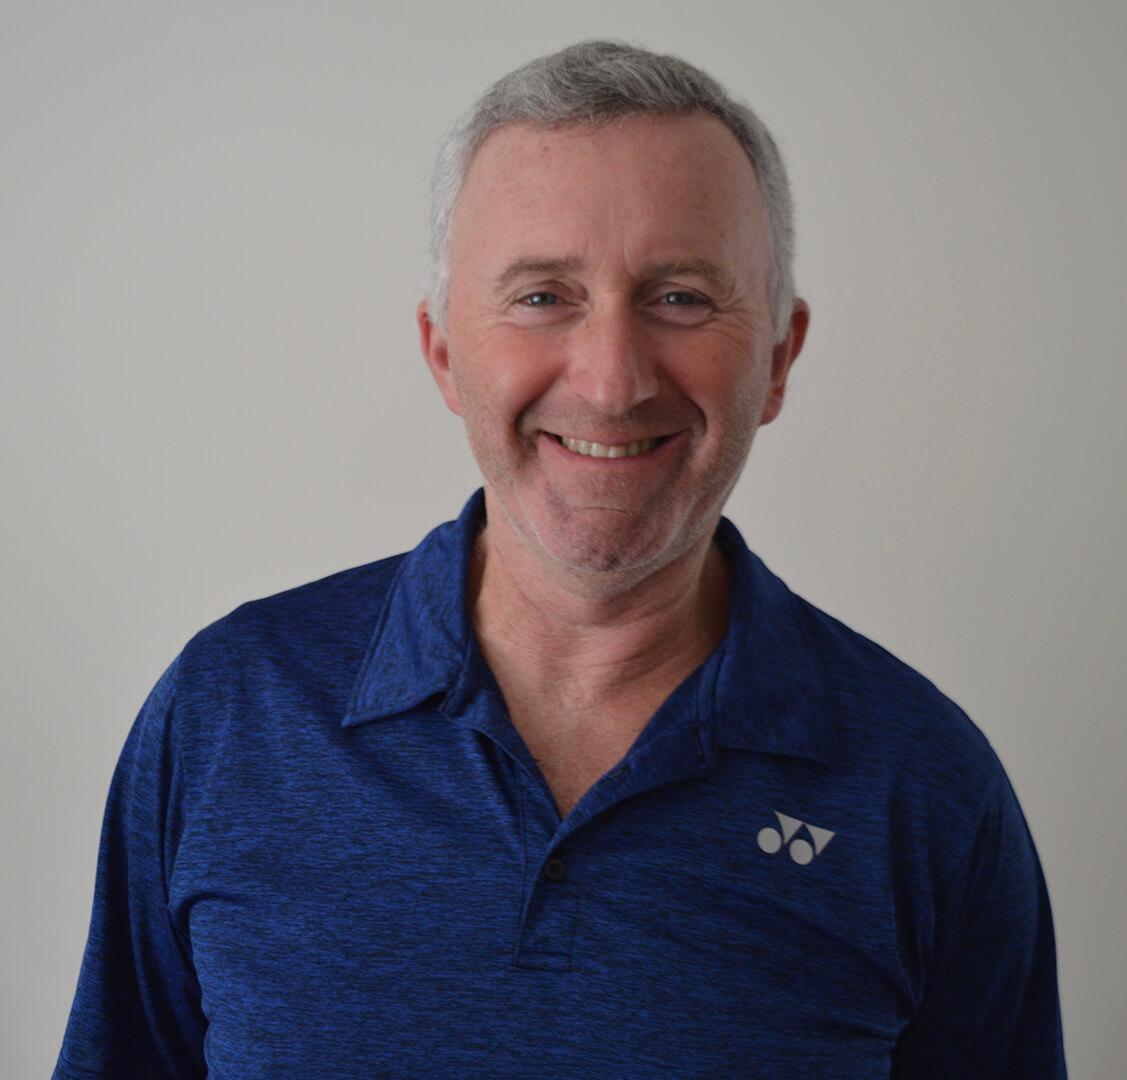 Down The Line Tennis Coach | Rowan Moss | LTA Level 5 Master Performance Coach